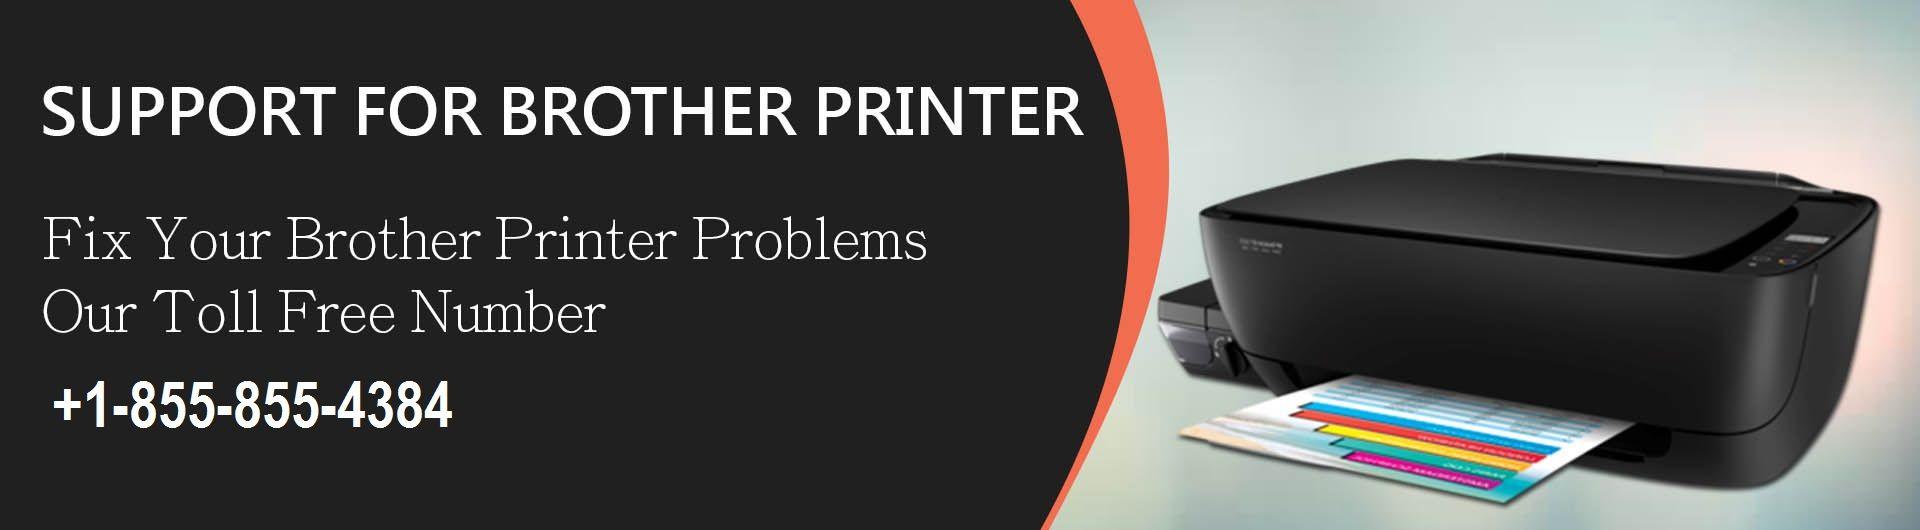 Brother printer customer service 18555600666 phone